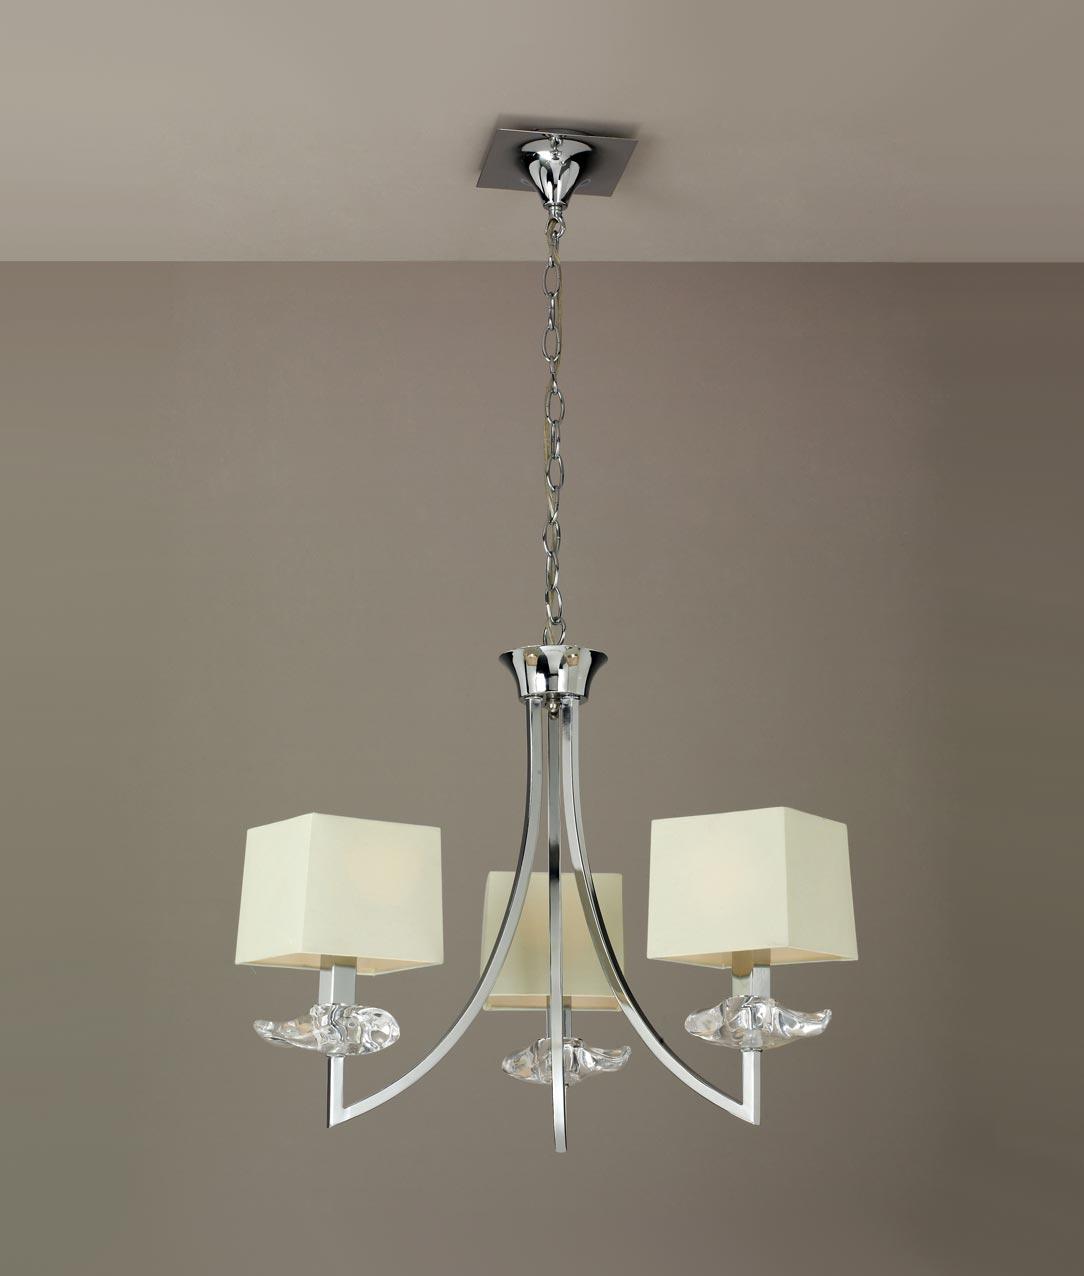 Luminaria techo crema cromo 3 luces AKIRA detalle